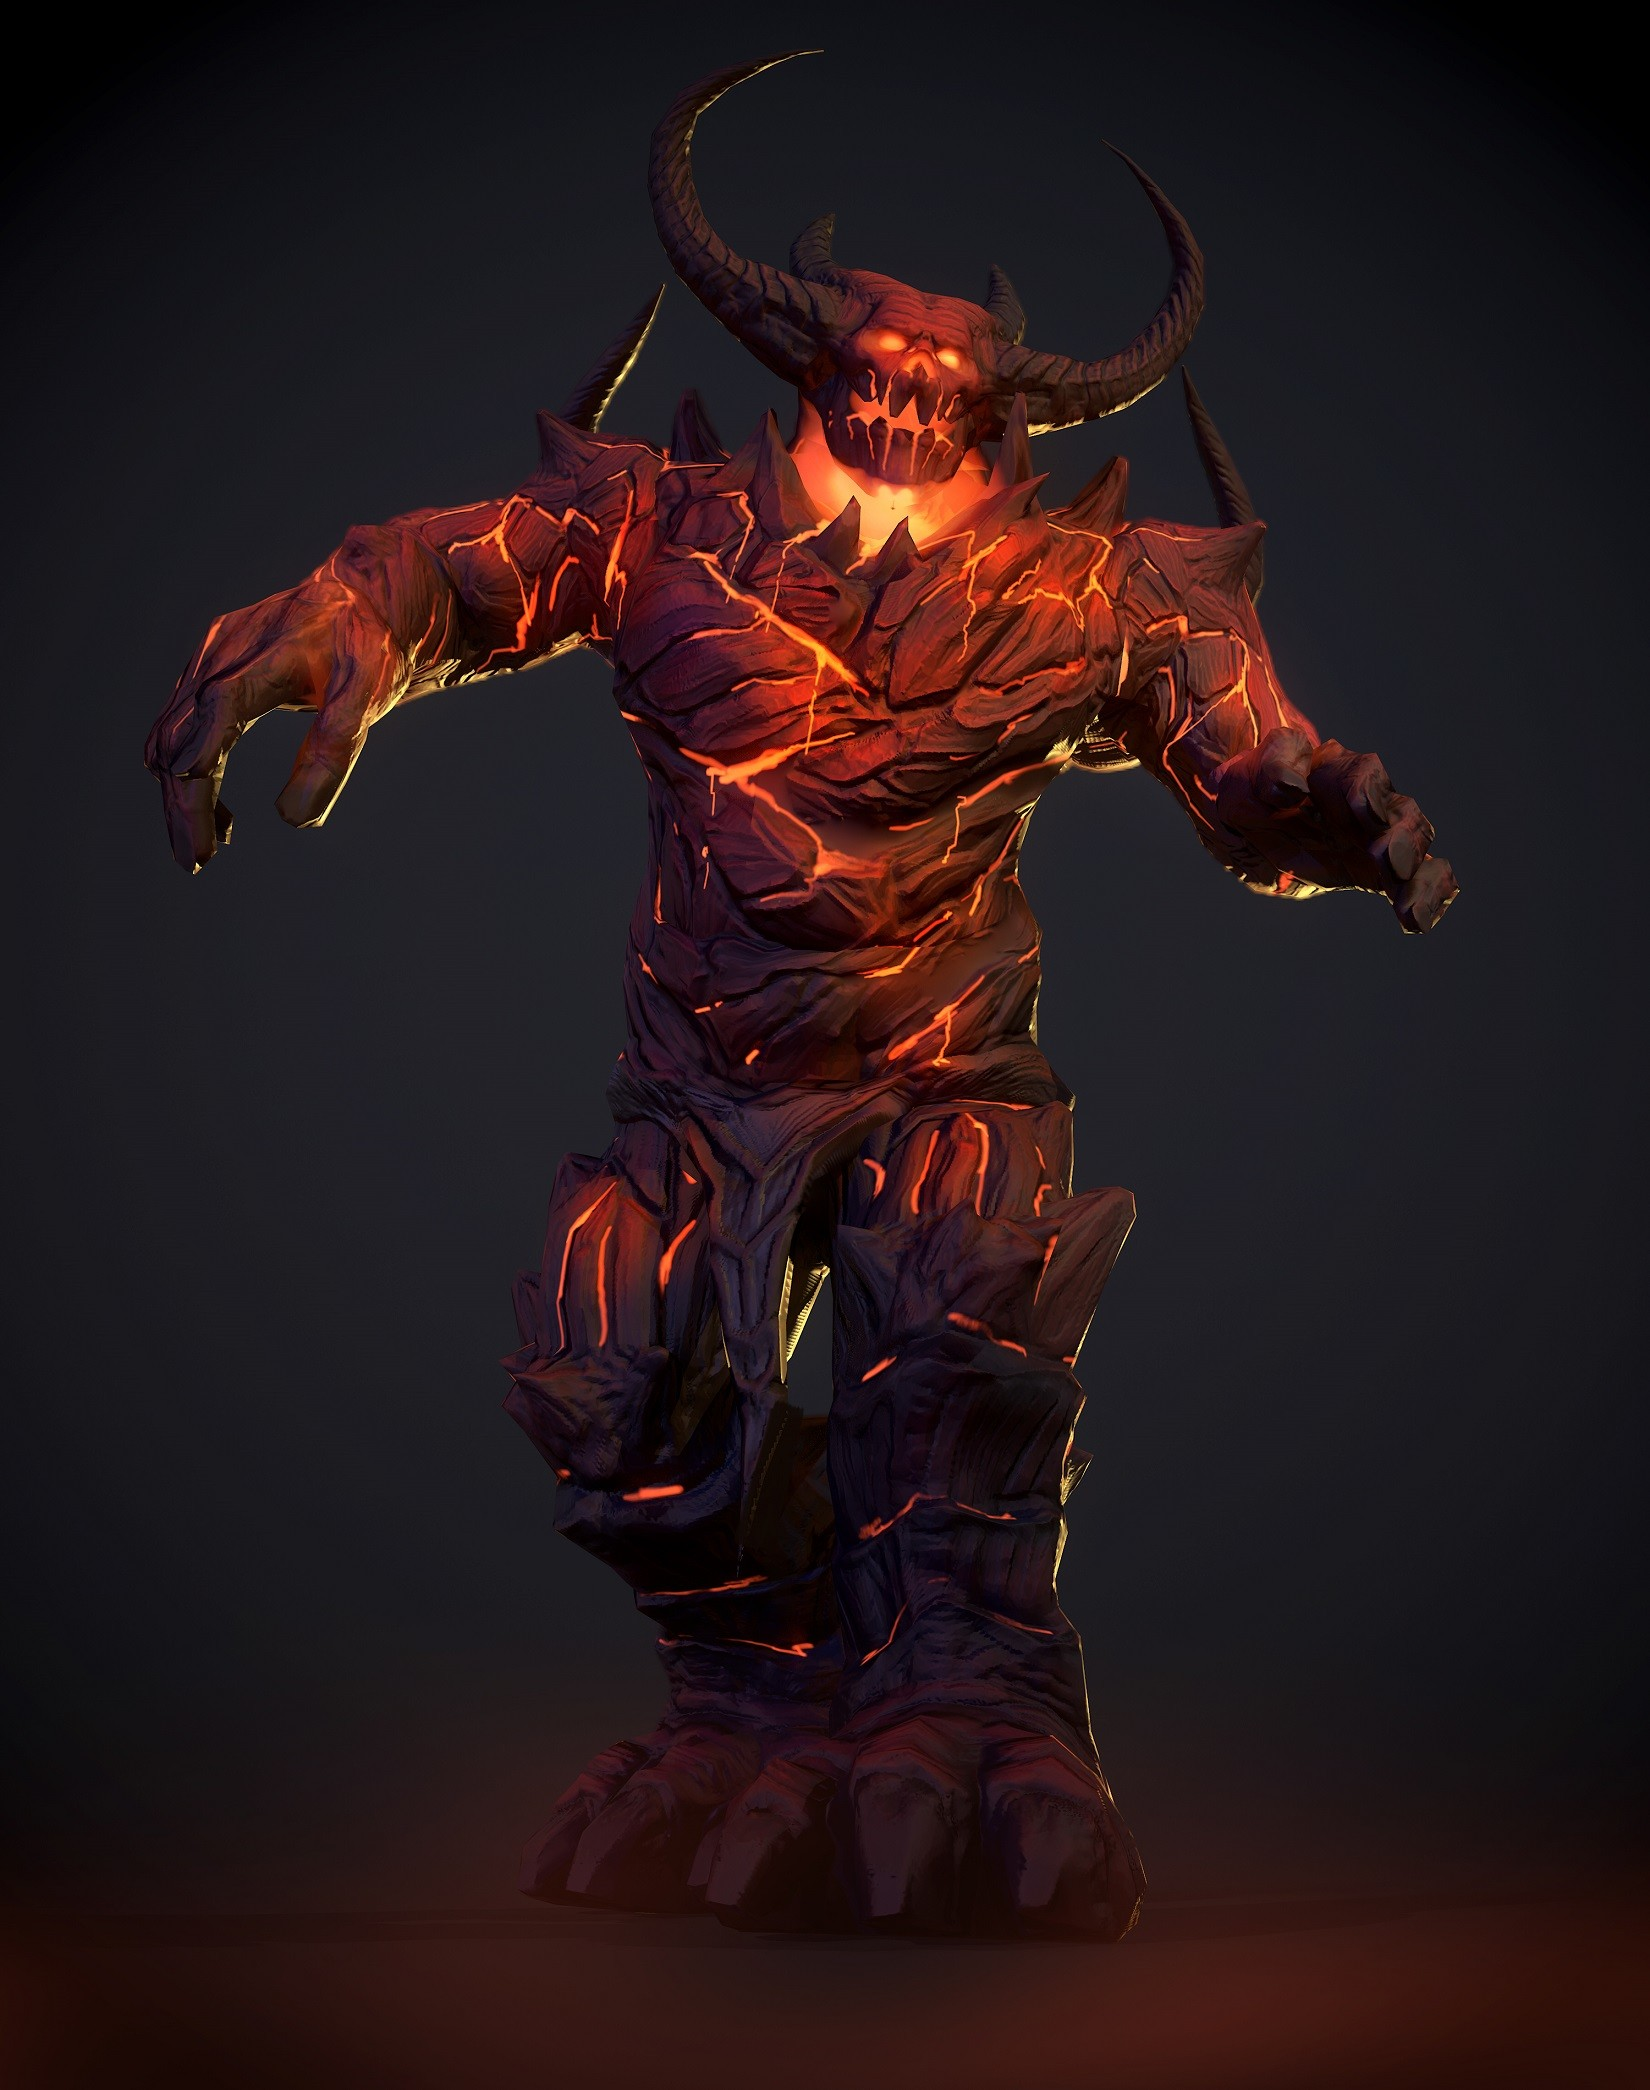 ArtStation - Lava Demon for VRchat avatar, Kevin Xu